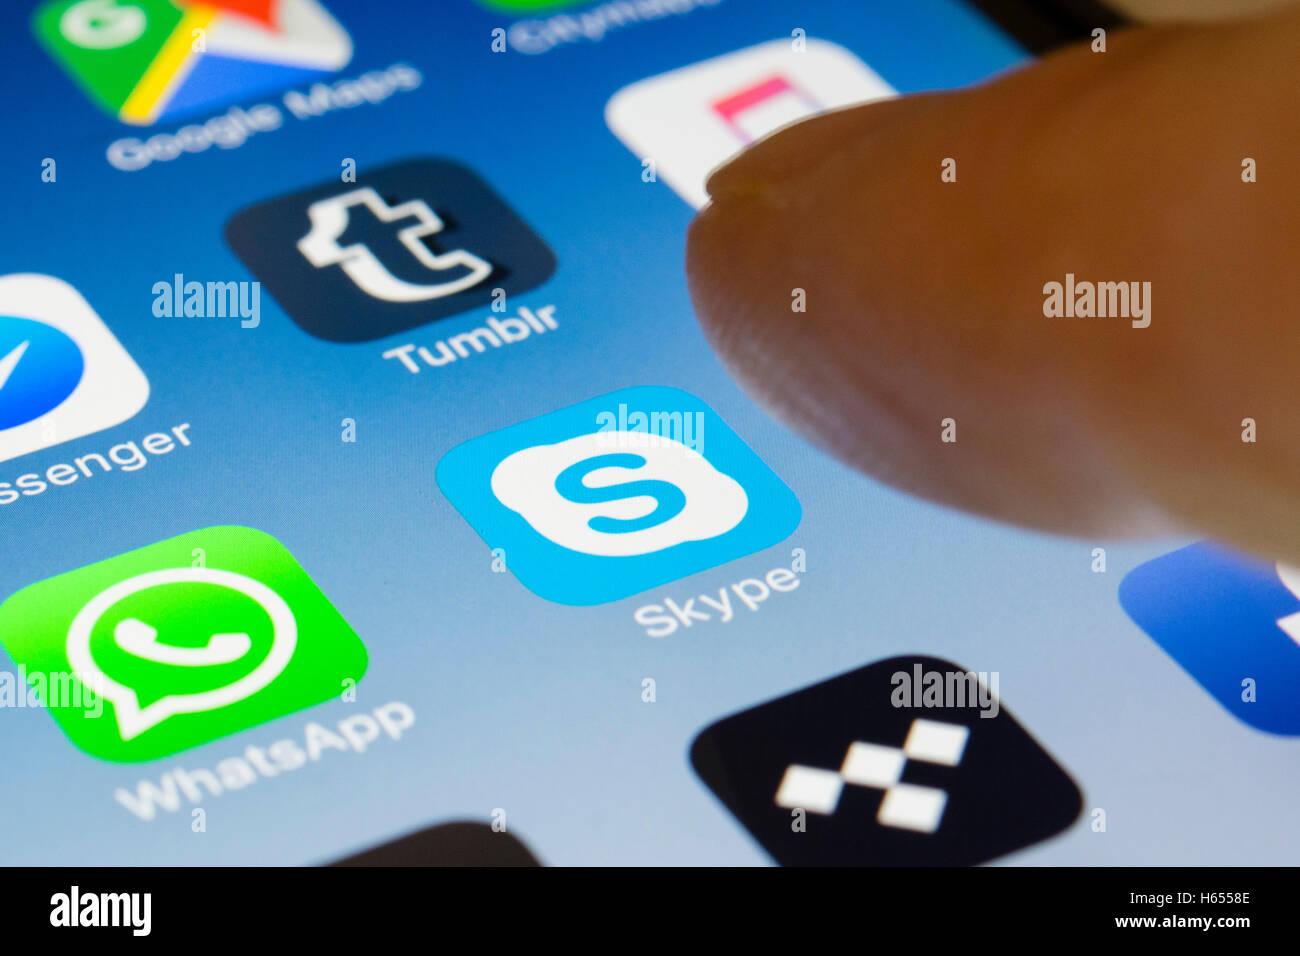 Skype online internet calling app close up on iPhone smart phone screen - Stock Image